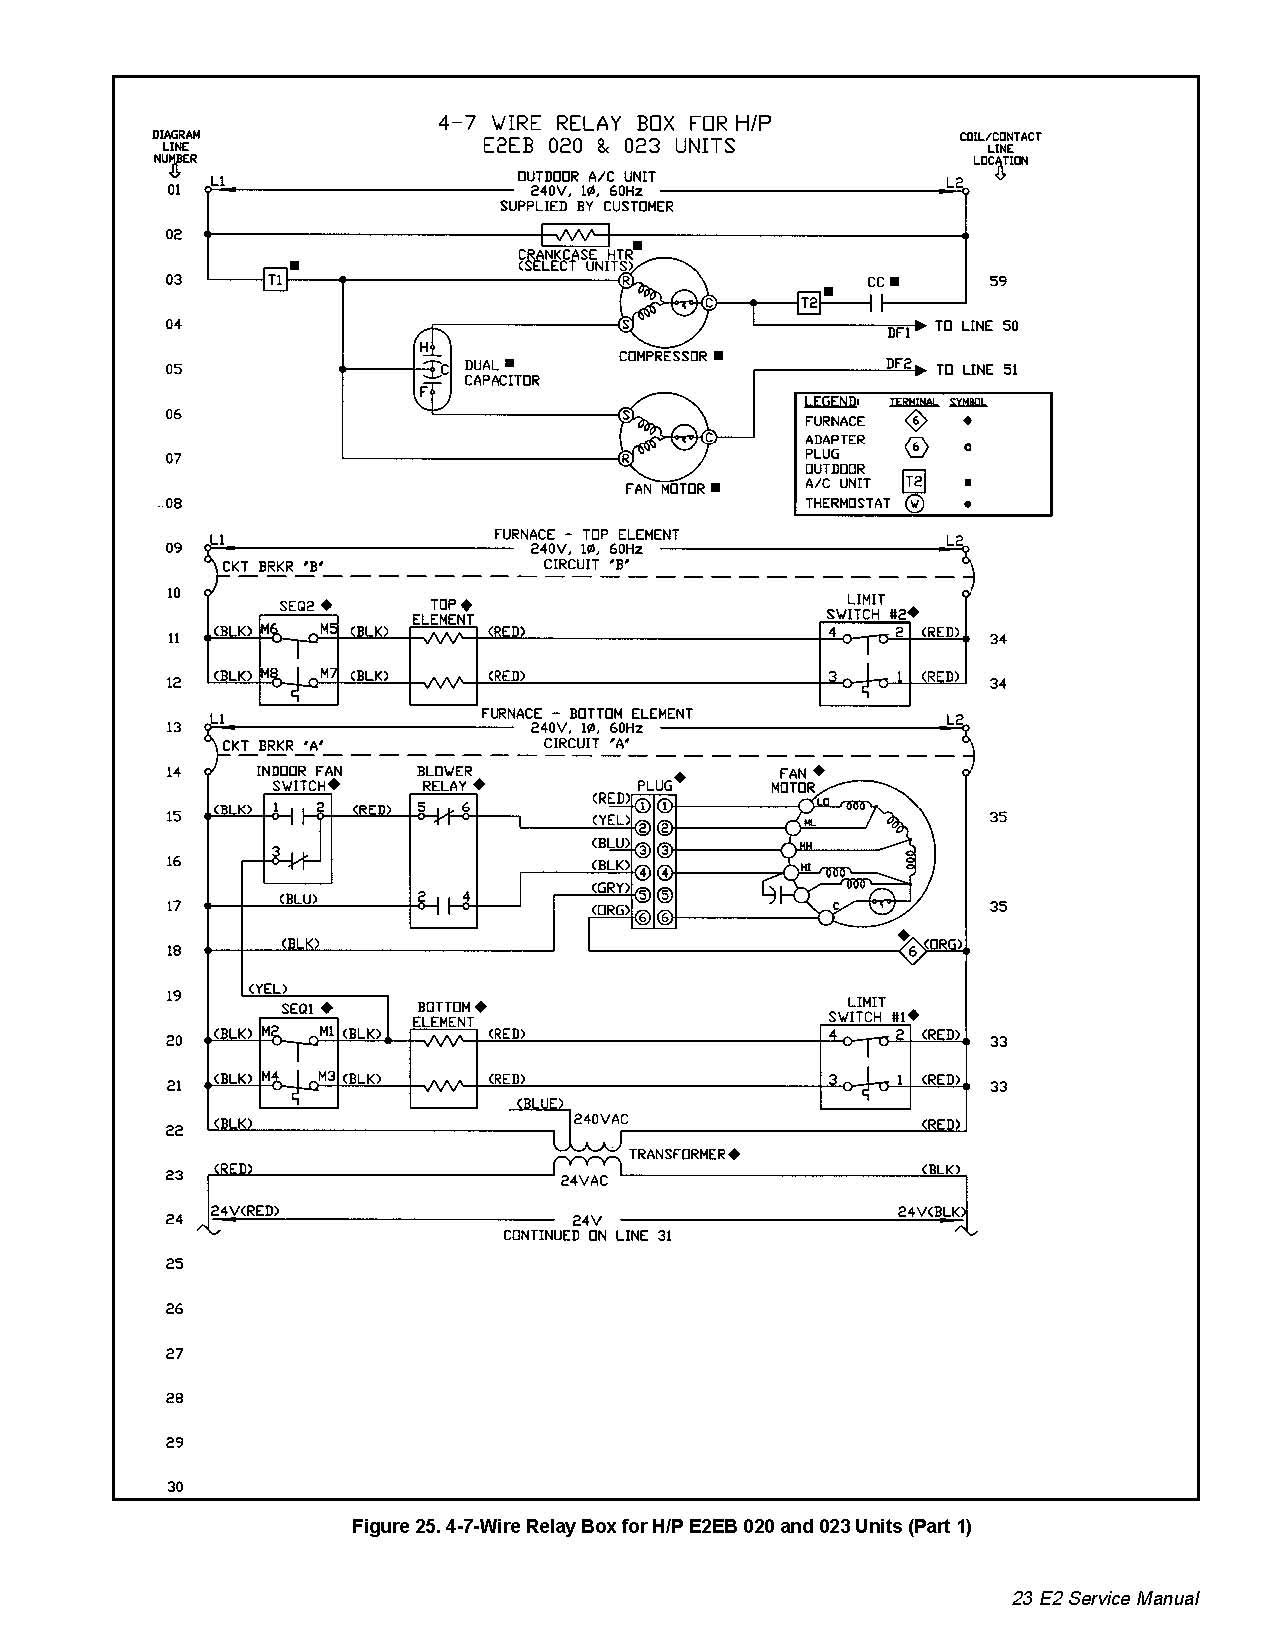 Intertherm Sequencer Wiring Diagram | Manual E-Books - Electric Furnace Wiring Diagram Sequencer